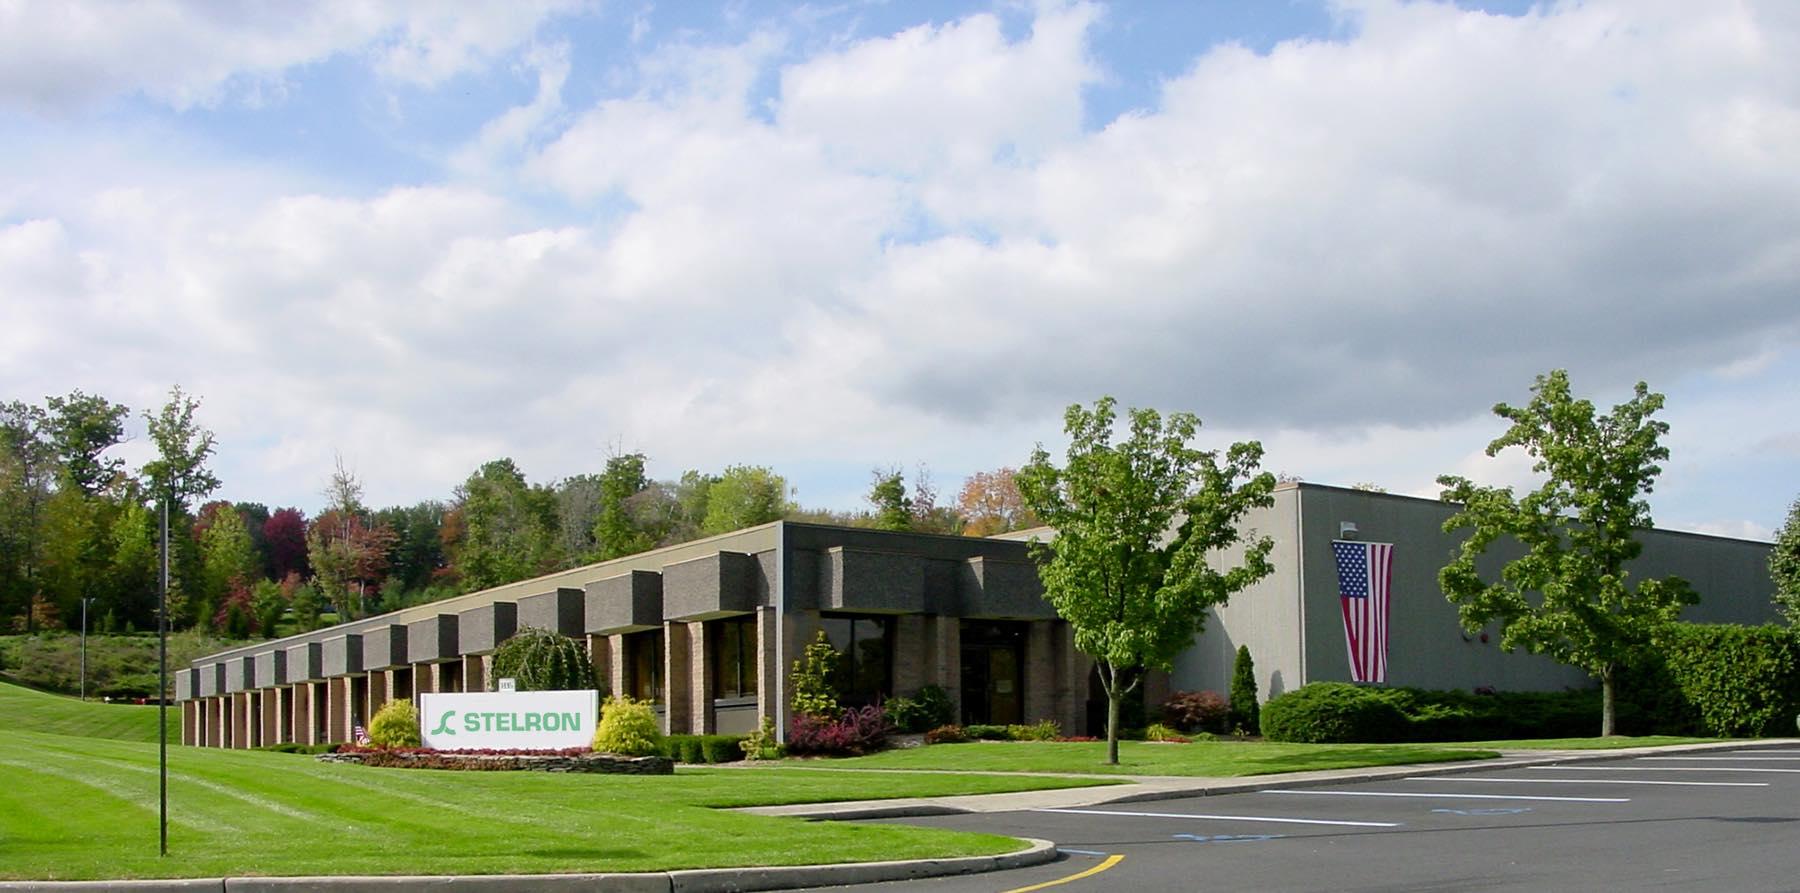 Stelron headquarters in Mahwah, NJ